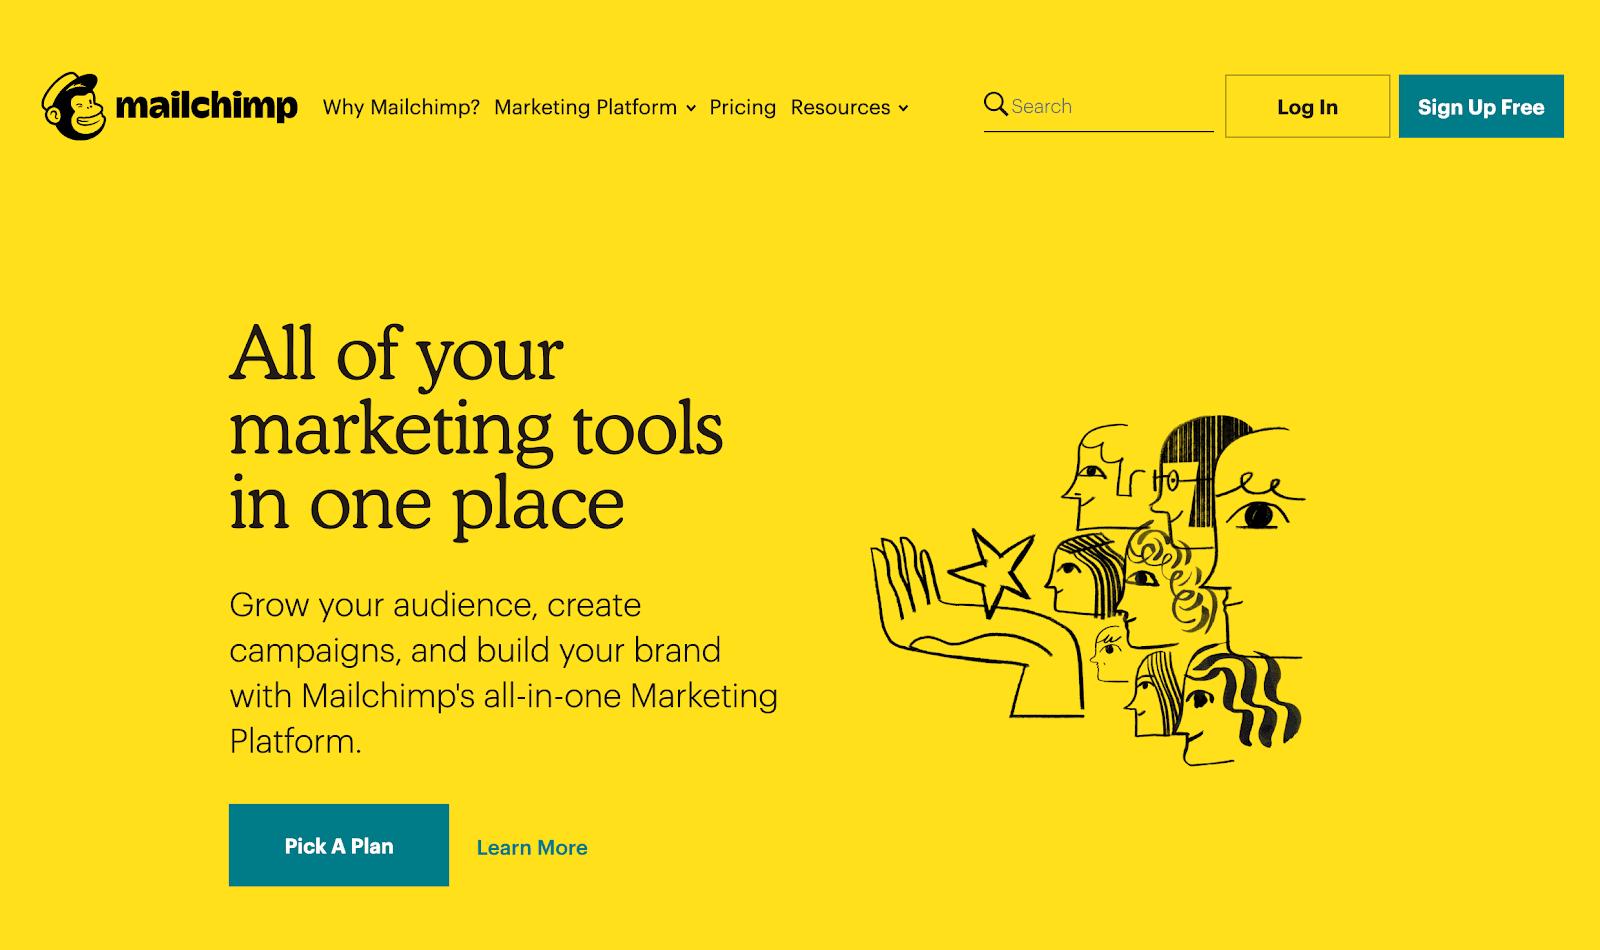 Email Marketing Service Provider - Mailchimp